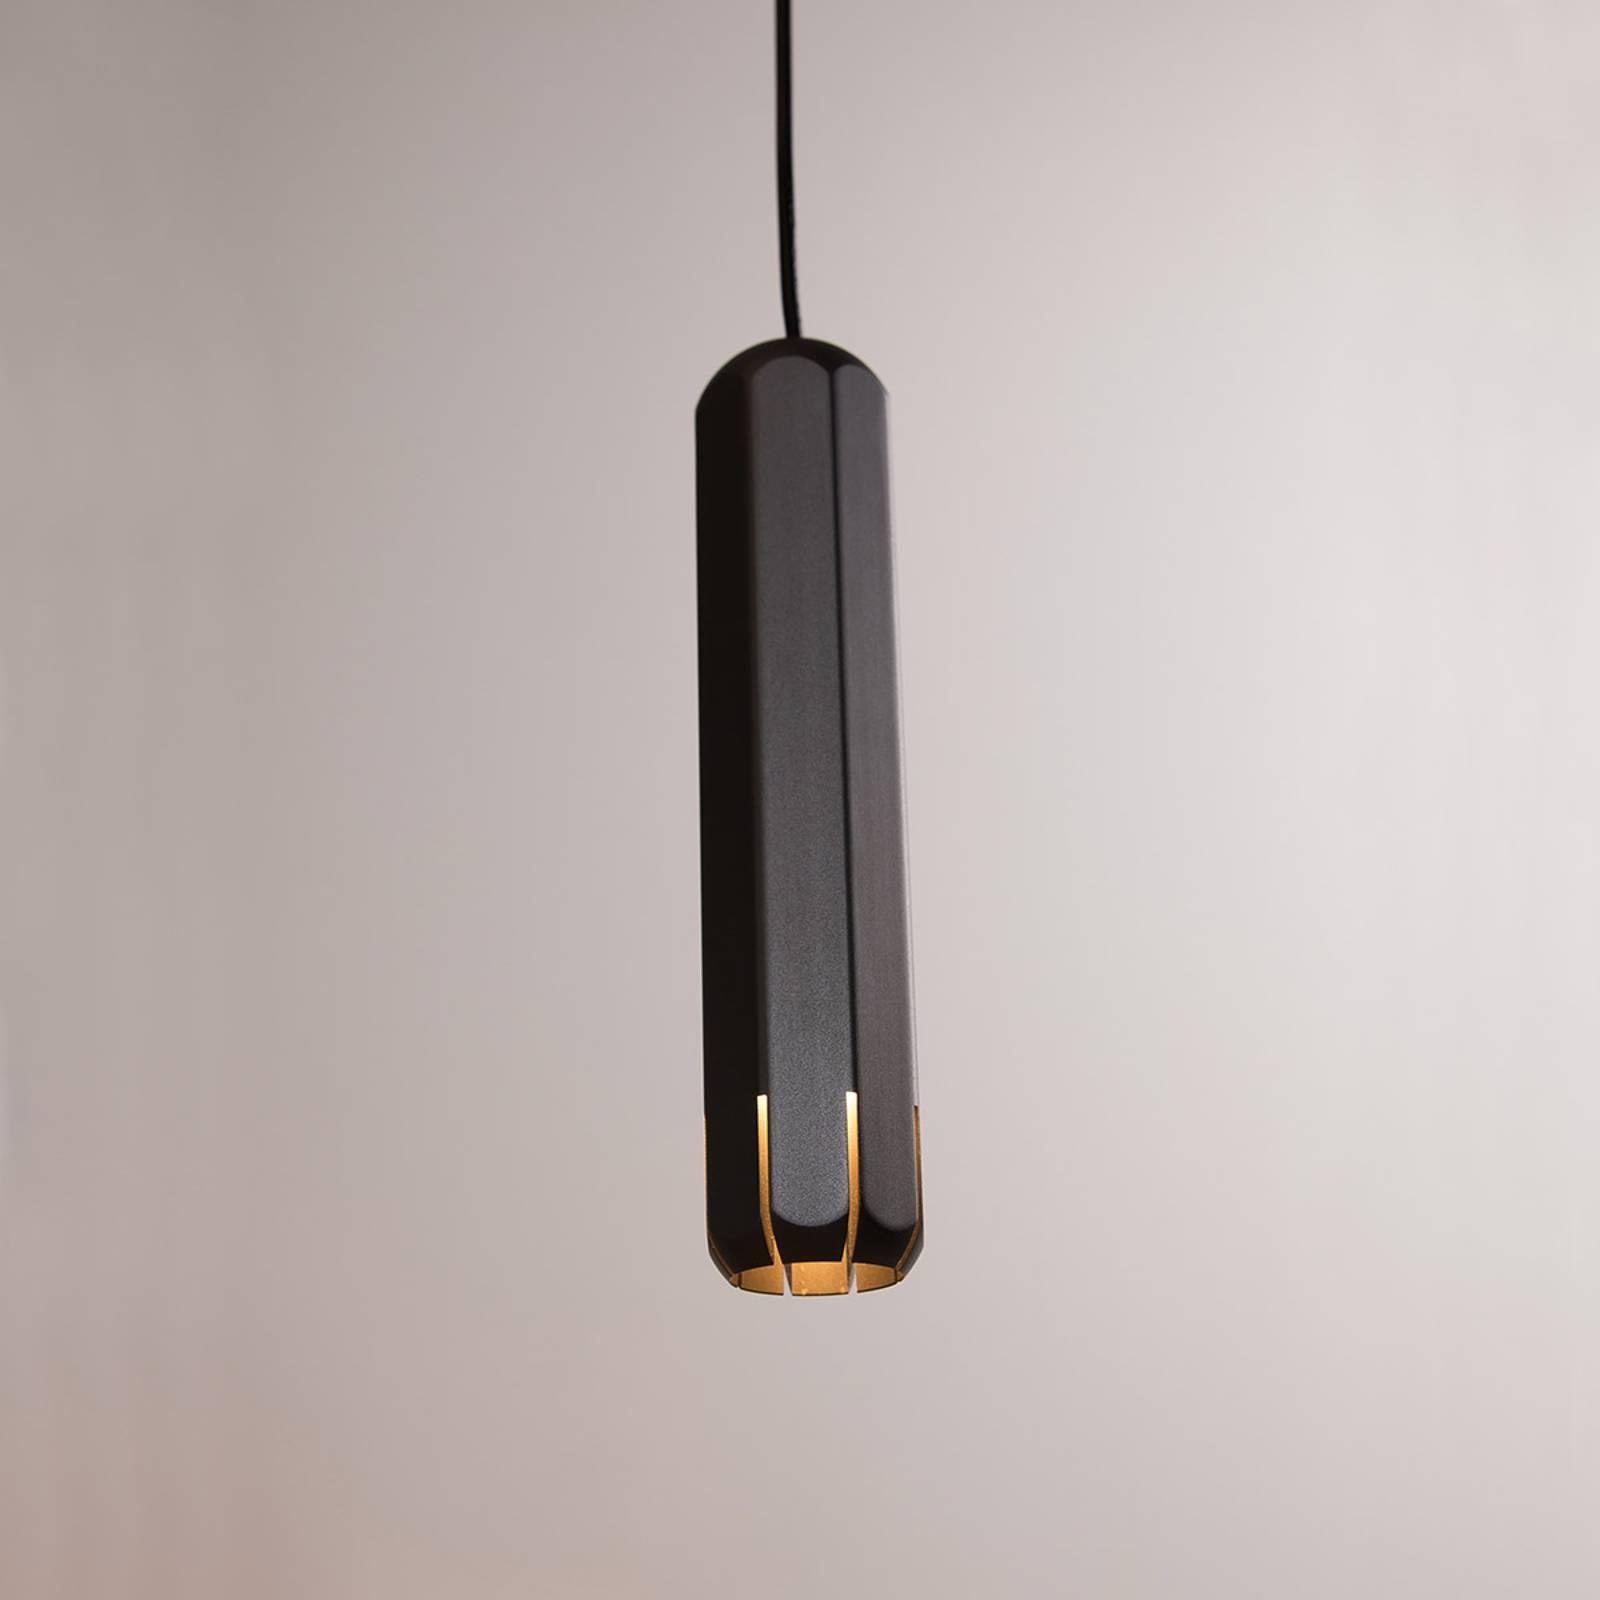 Innermost Brixton Spot 20-LED-riippuvalo grafiitti